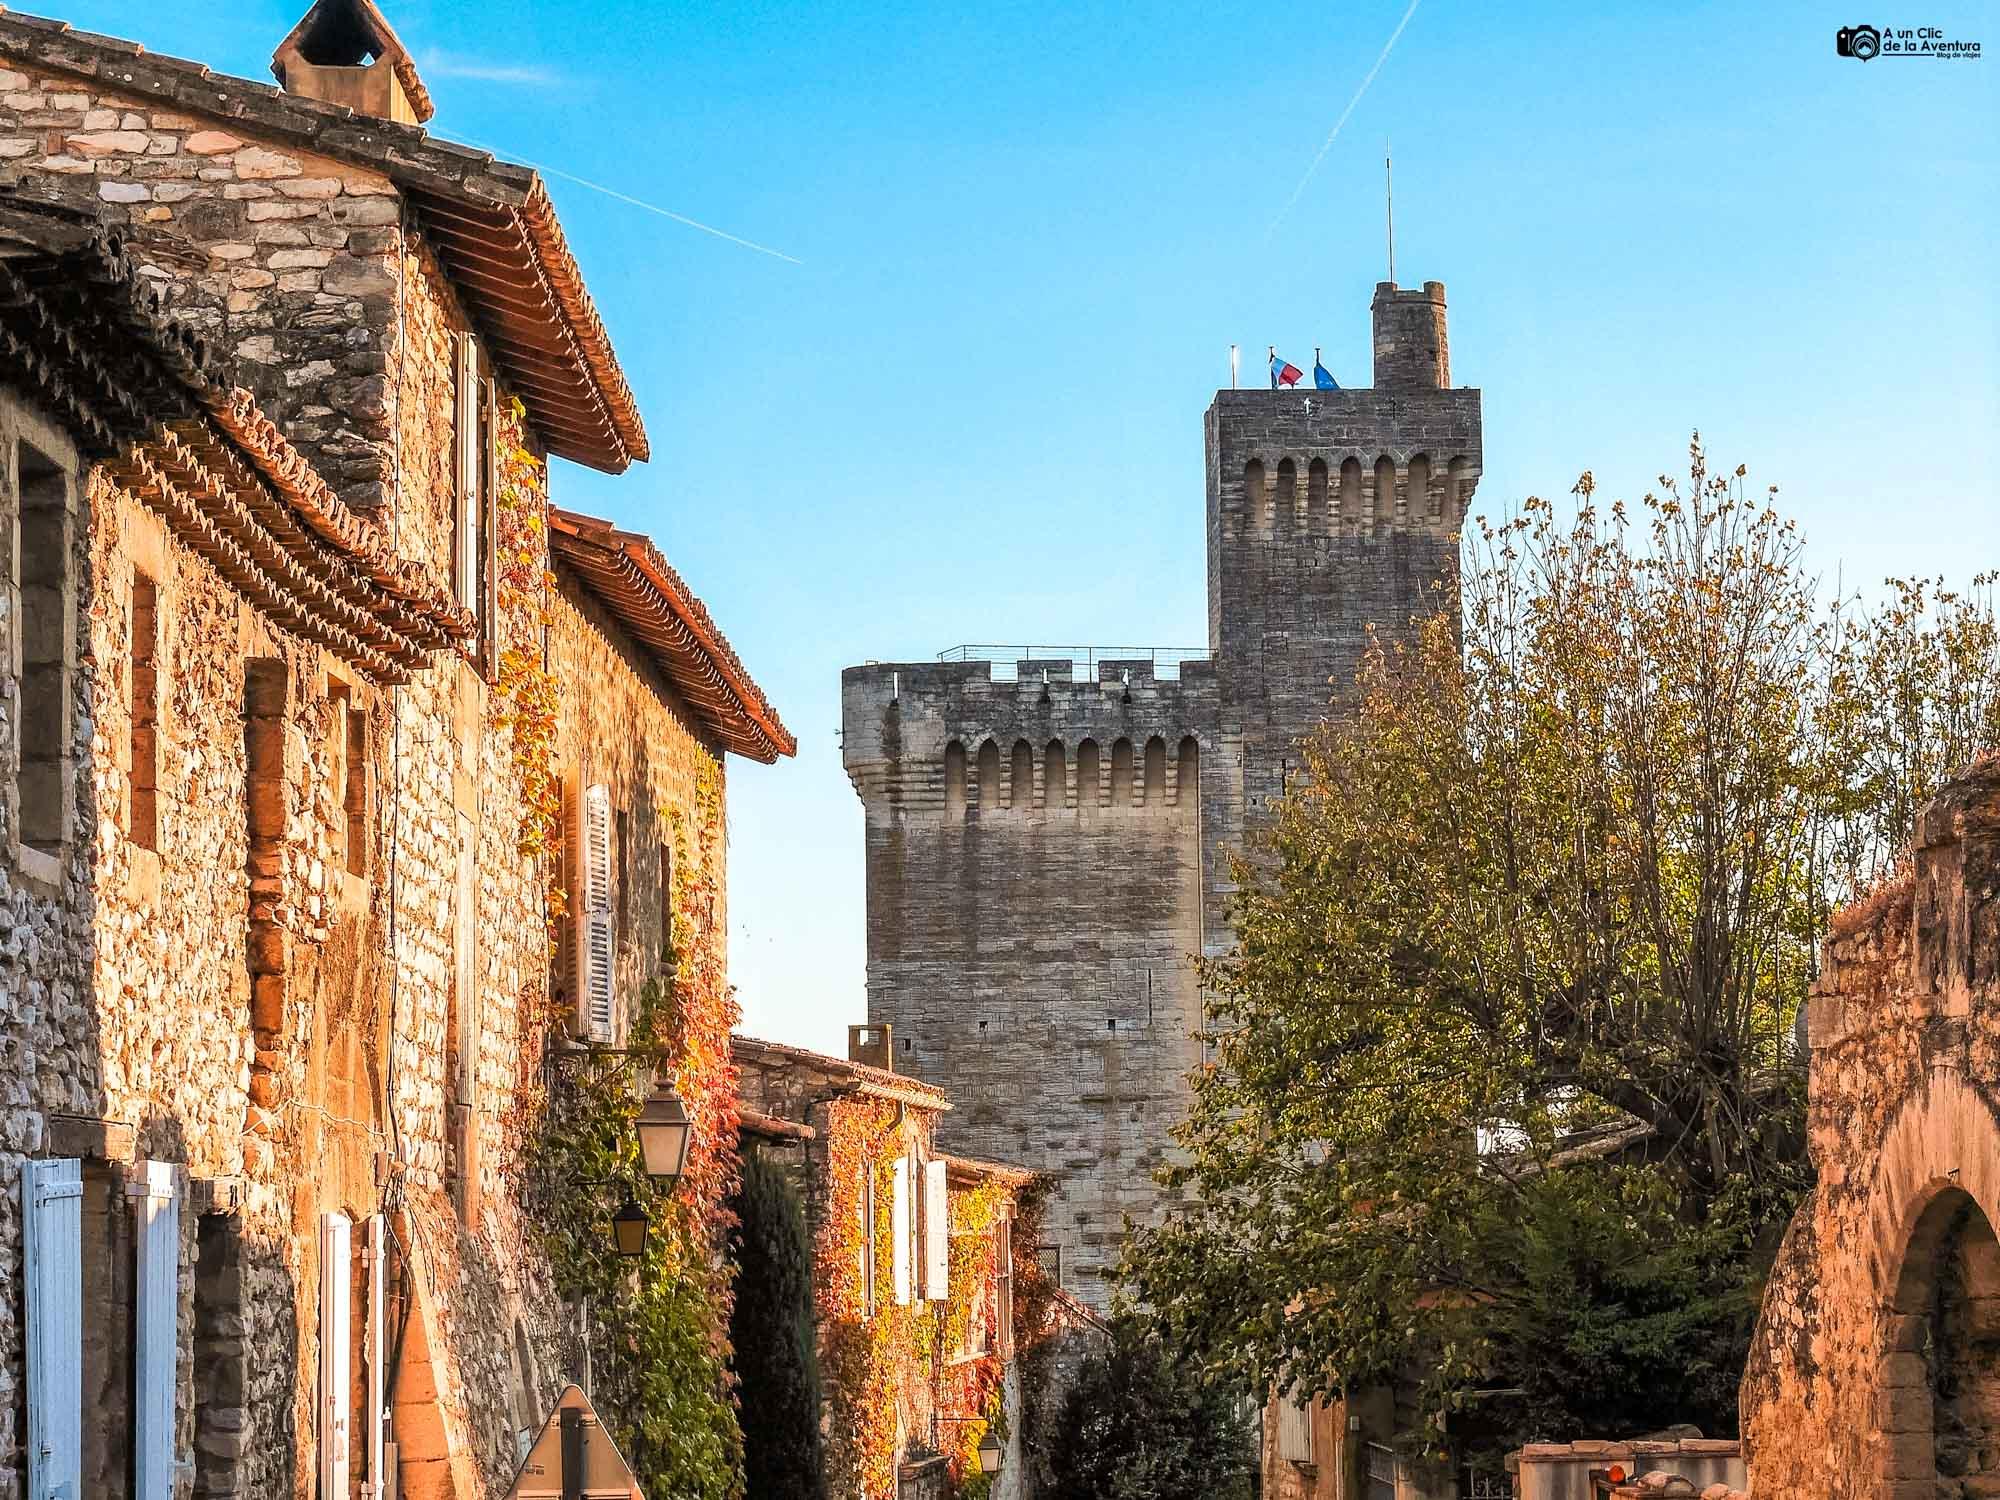 Torre de Felipe el Hermoso en Villeneuve-les-Avignon